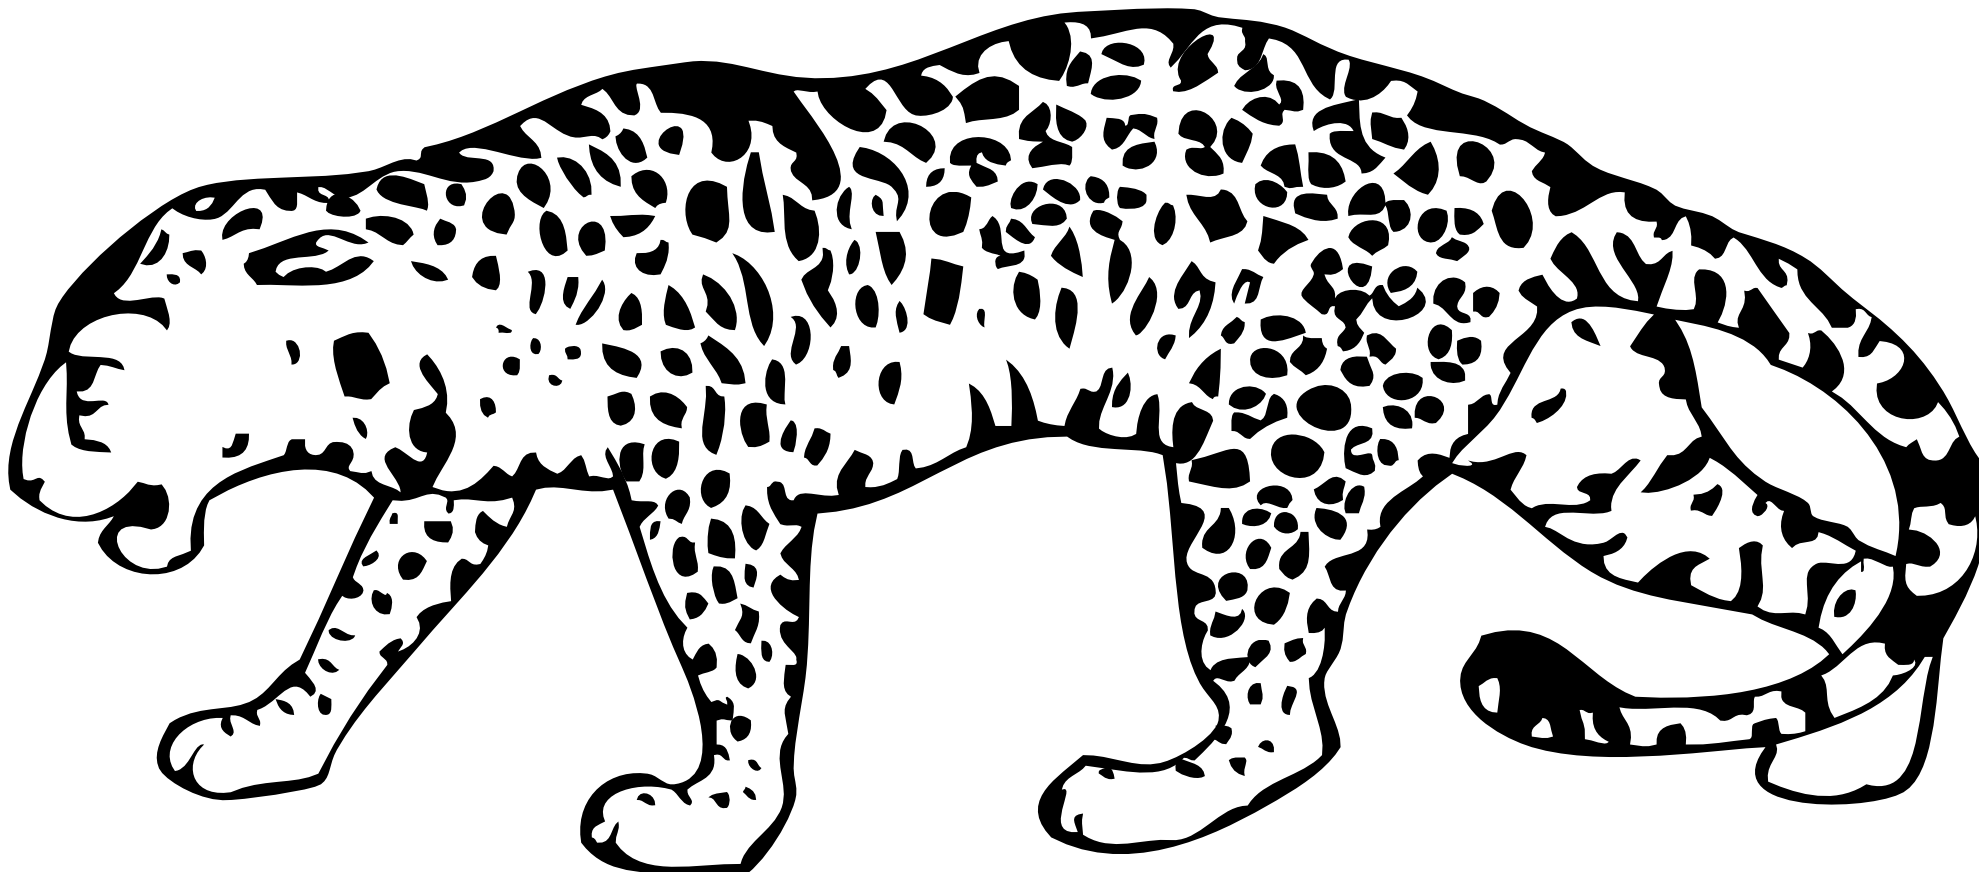 Jaguar Png Clipart 1 - Jaguar PNG Black And White